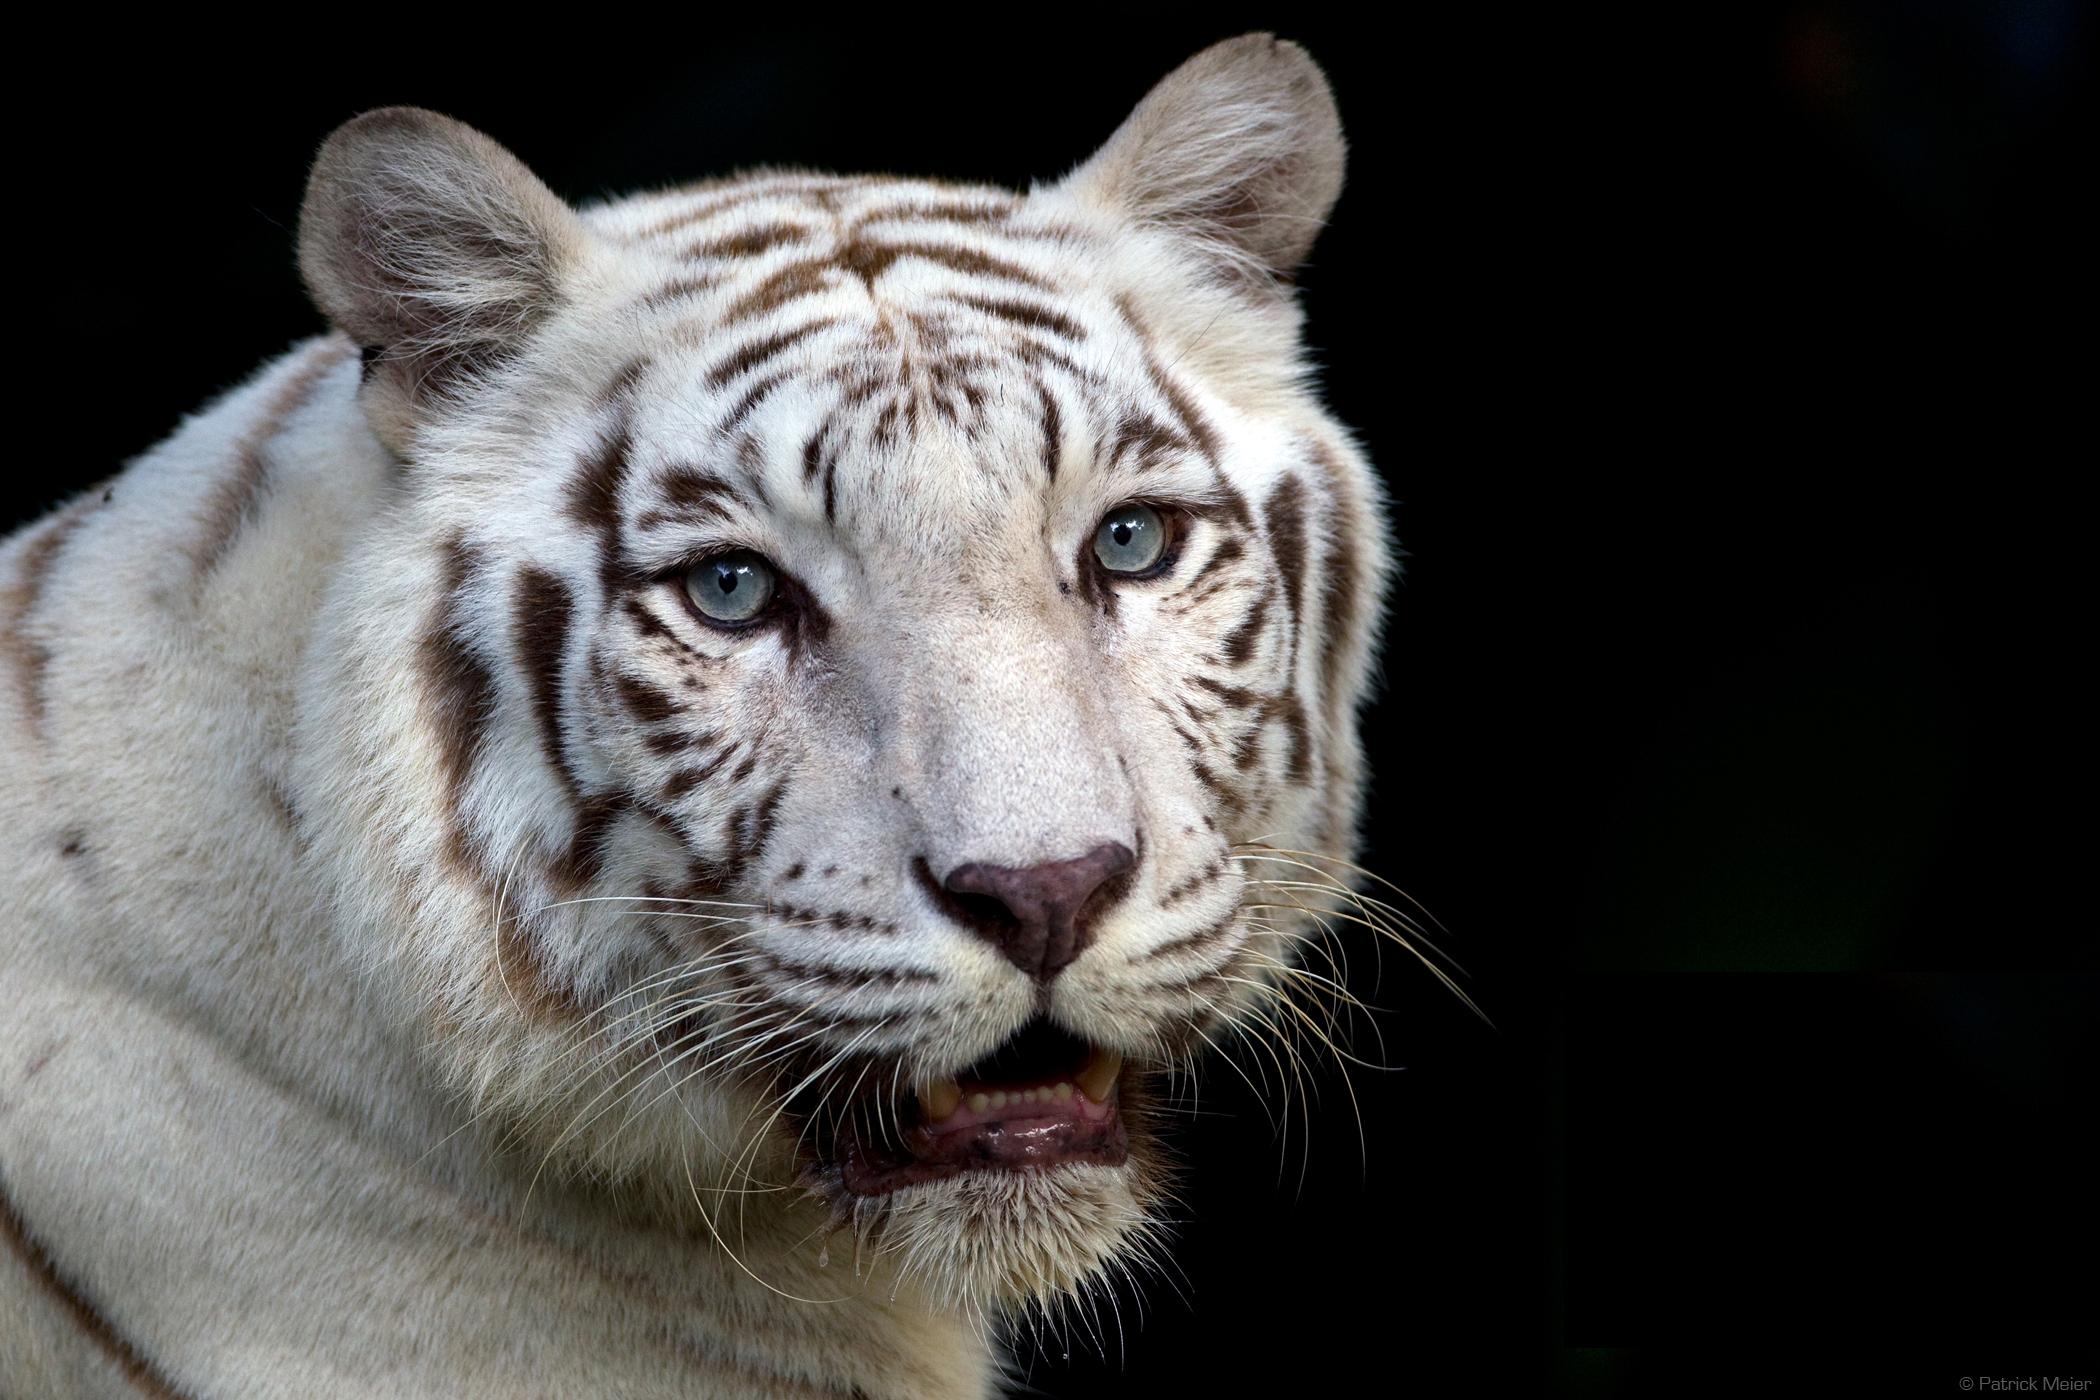 White bengal tiger Singapore Zoo 2100x1400